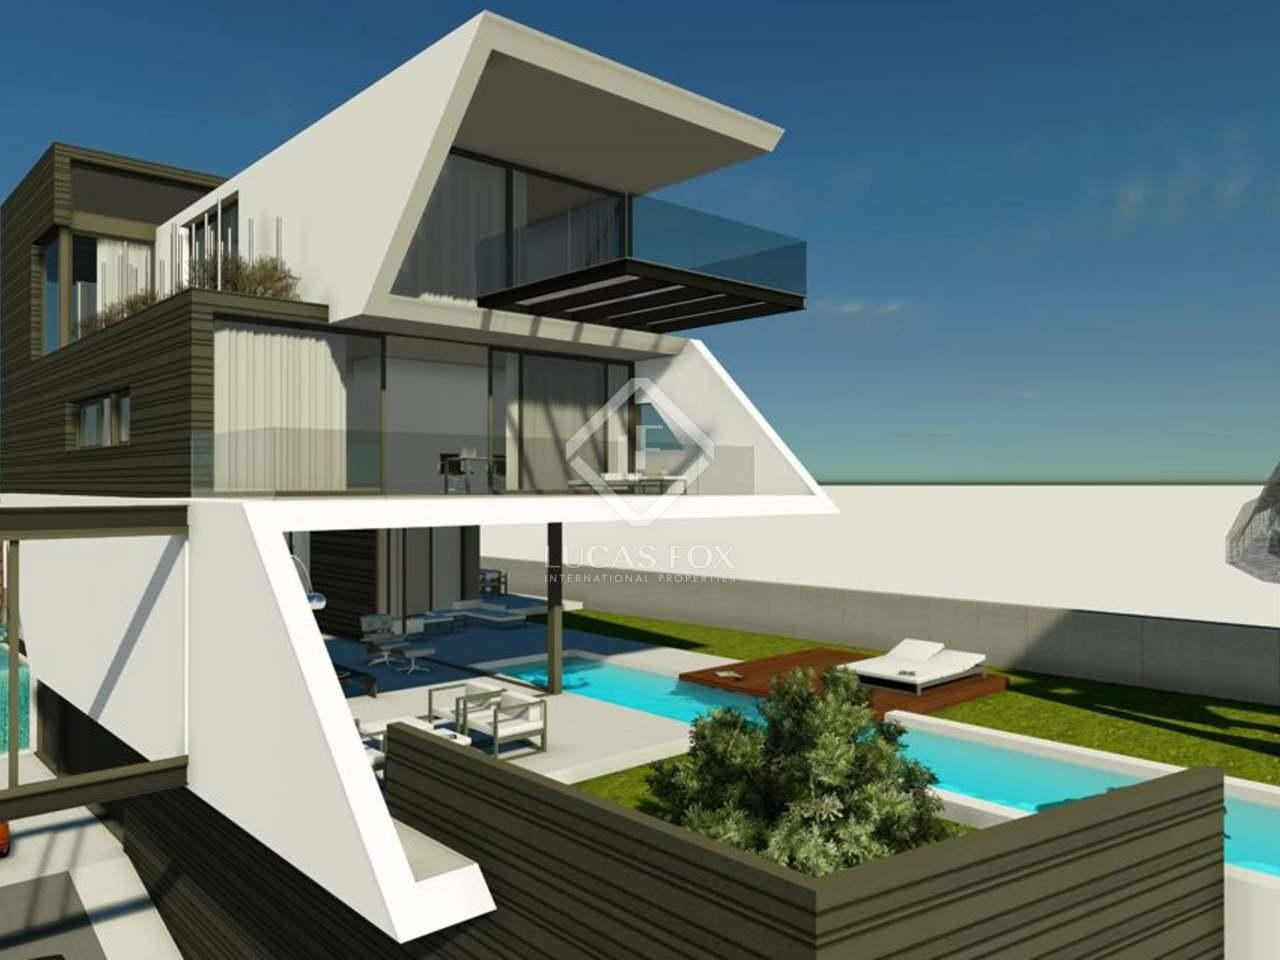 Designer house for sale sant cugat near barcelona for Casas con piscina baratas barcelona